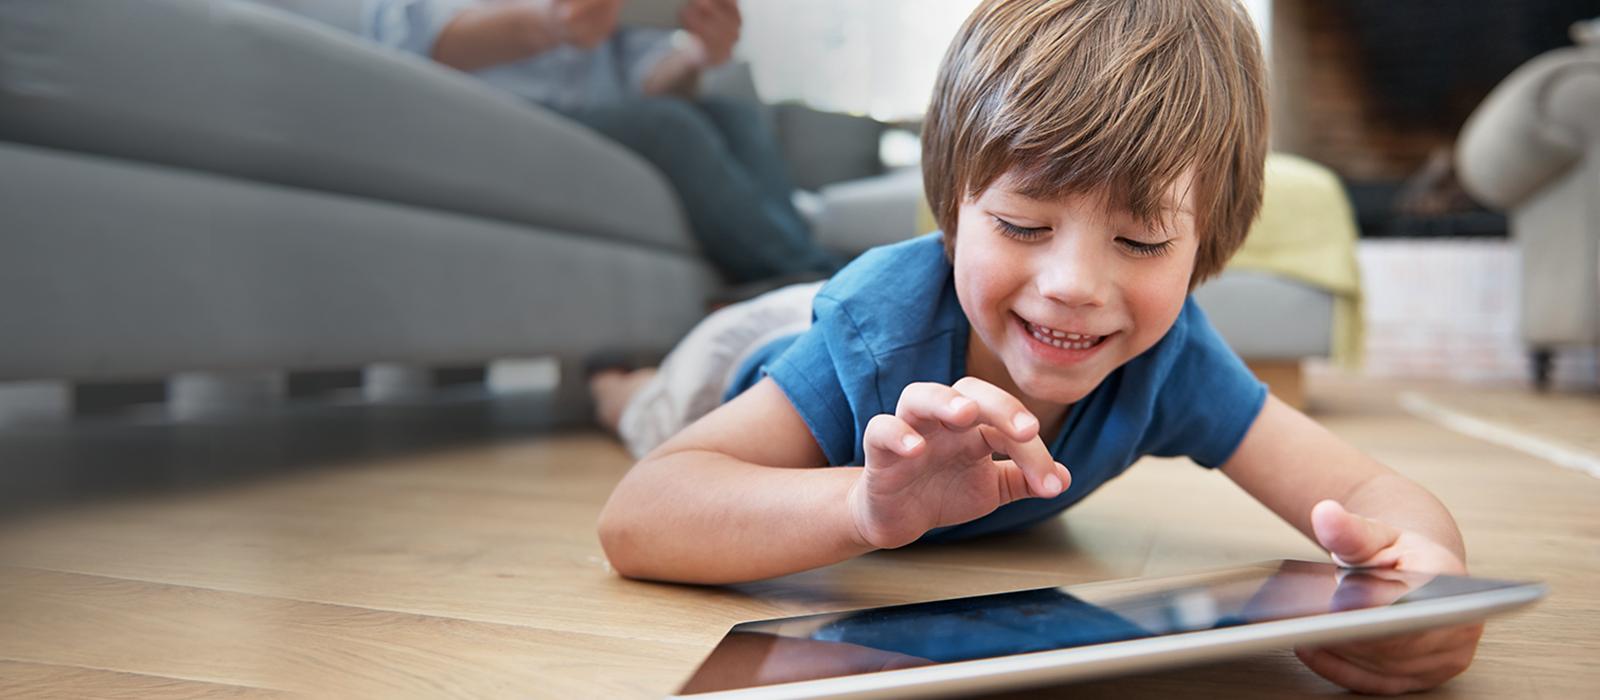 Self Defense on device - Parental control software